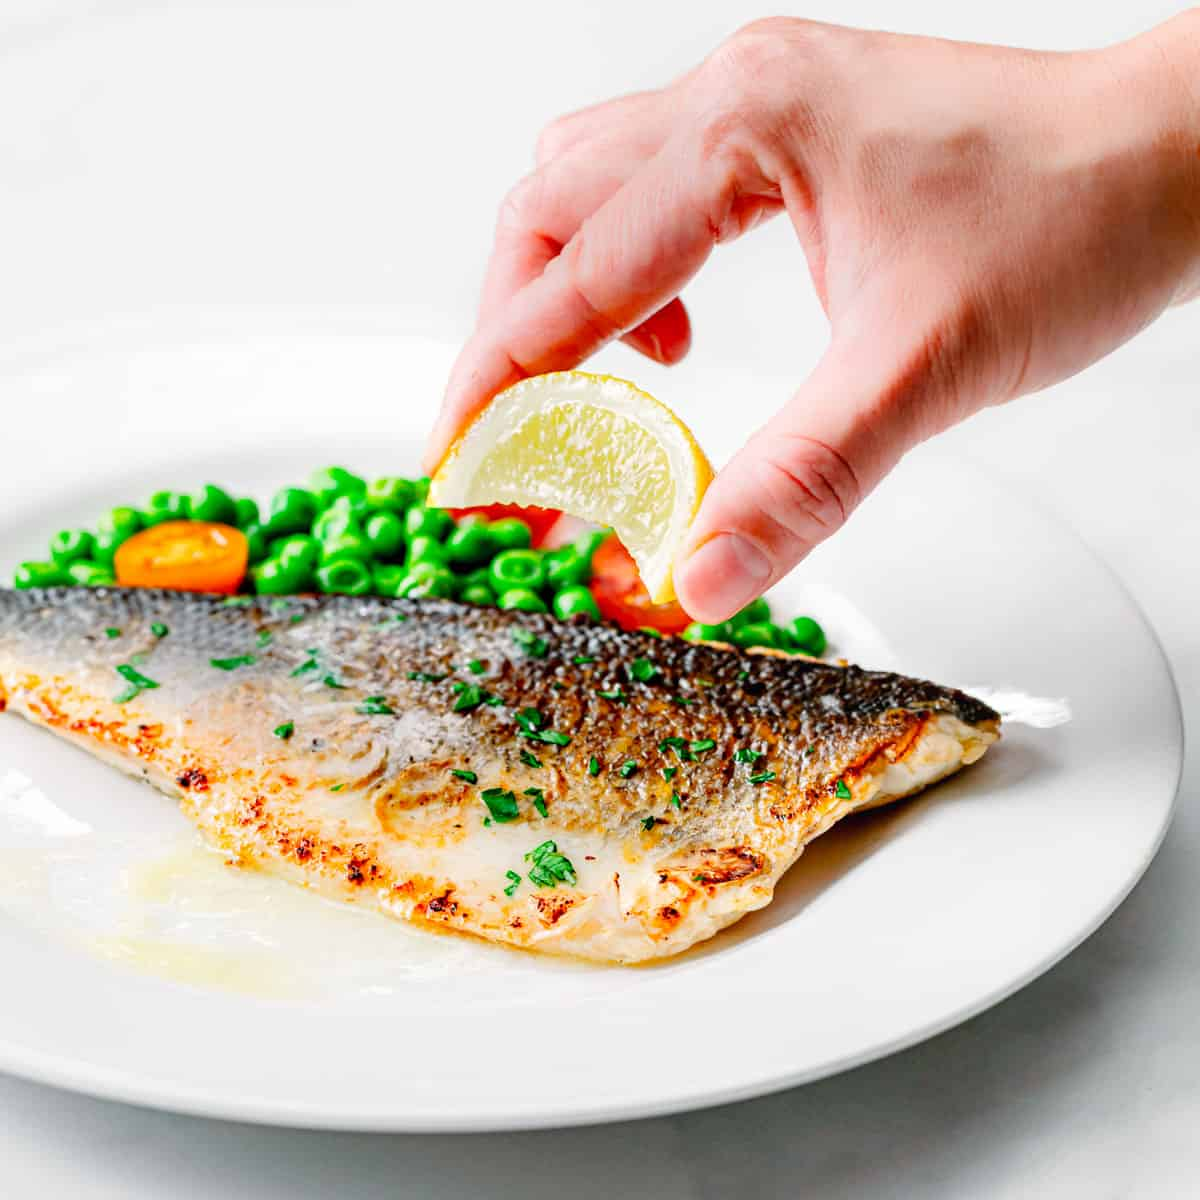 pan-seared branzino fish fillets.